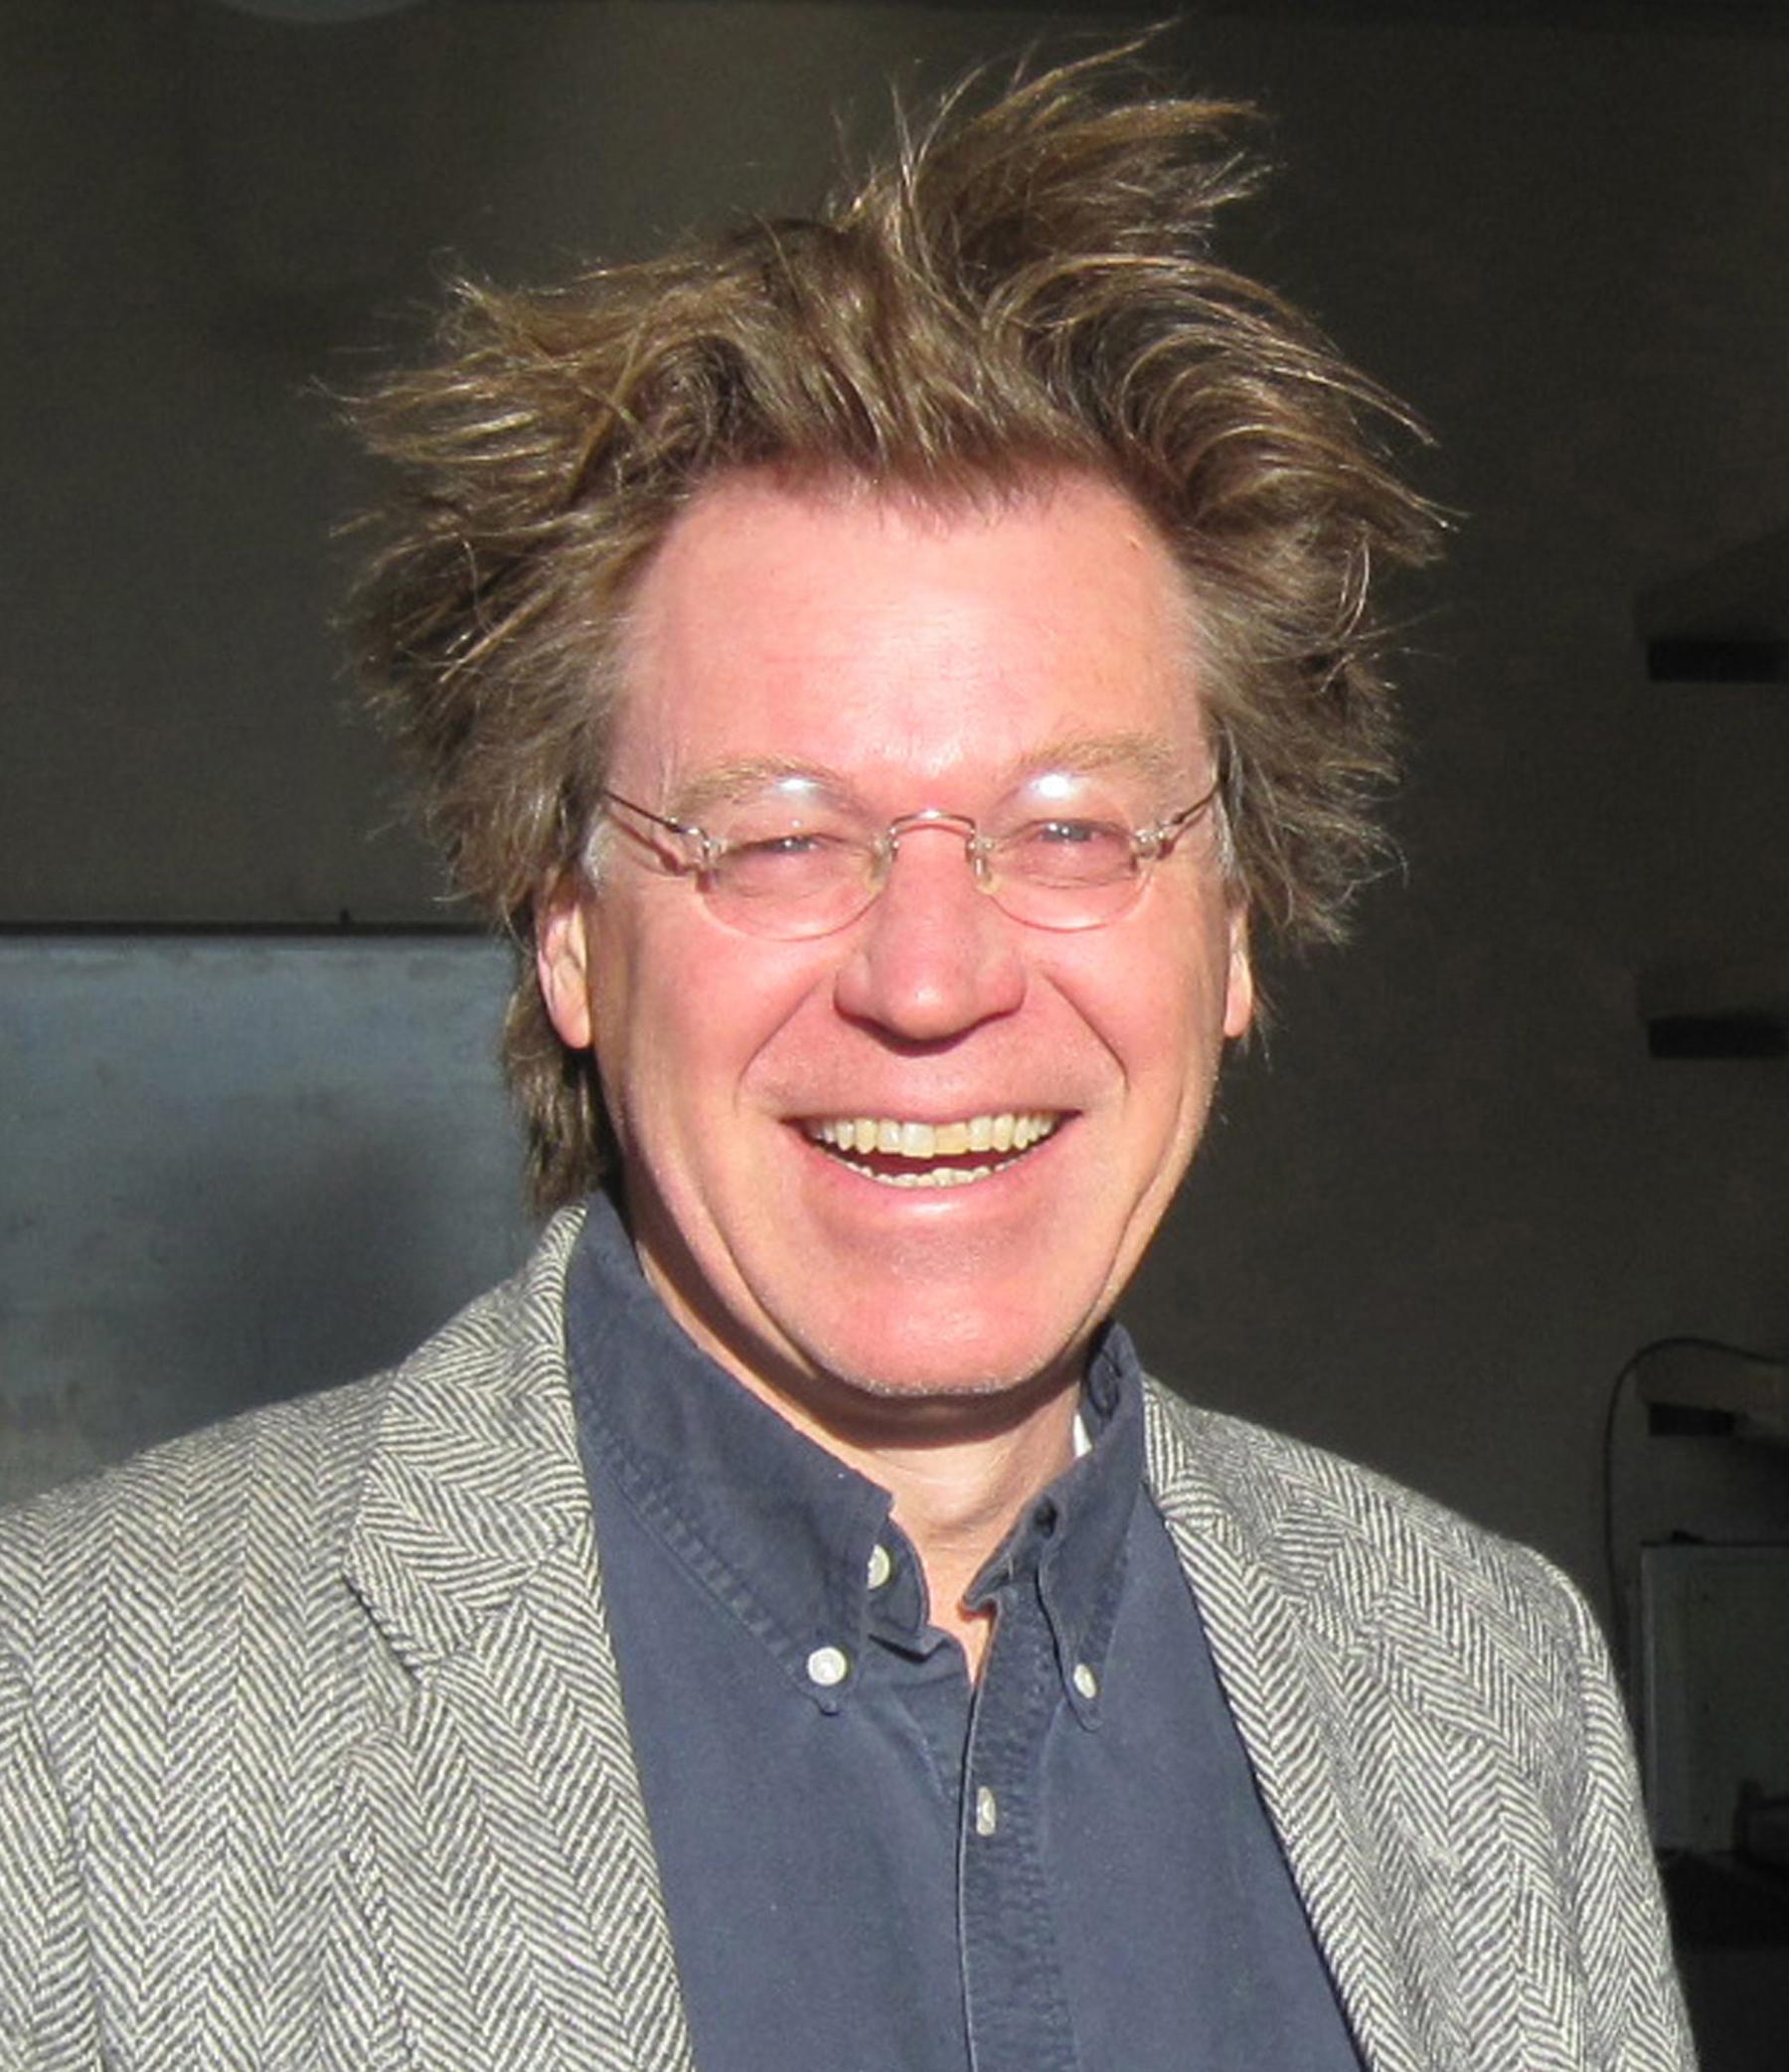 University of Utah biologist Erik Jorgensen